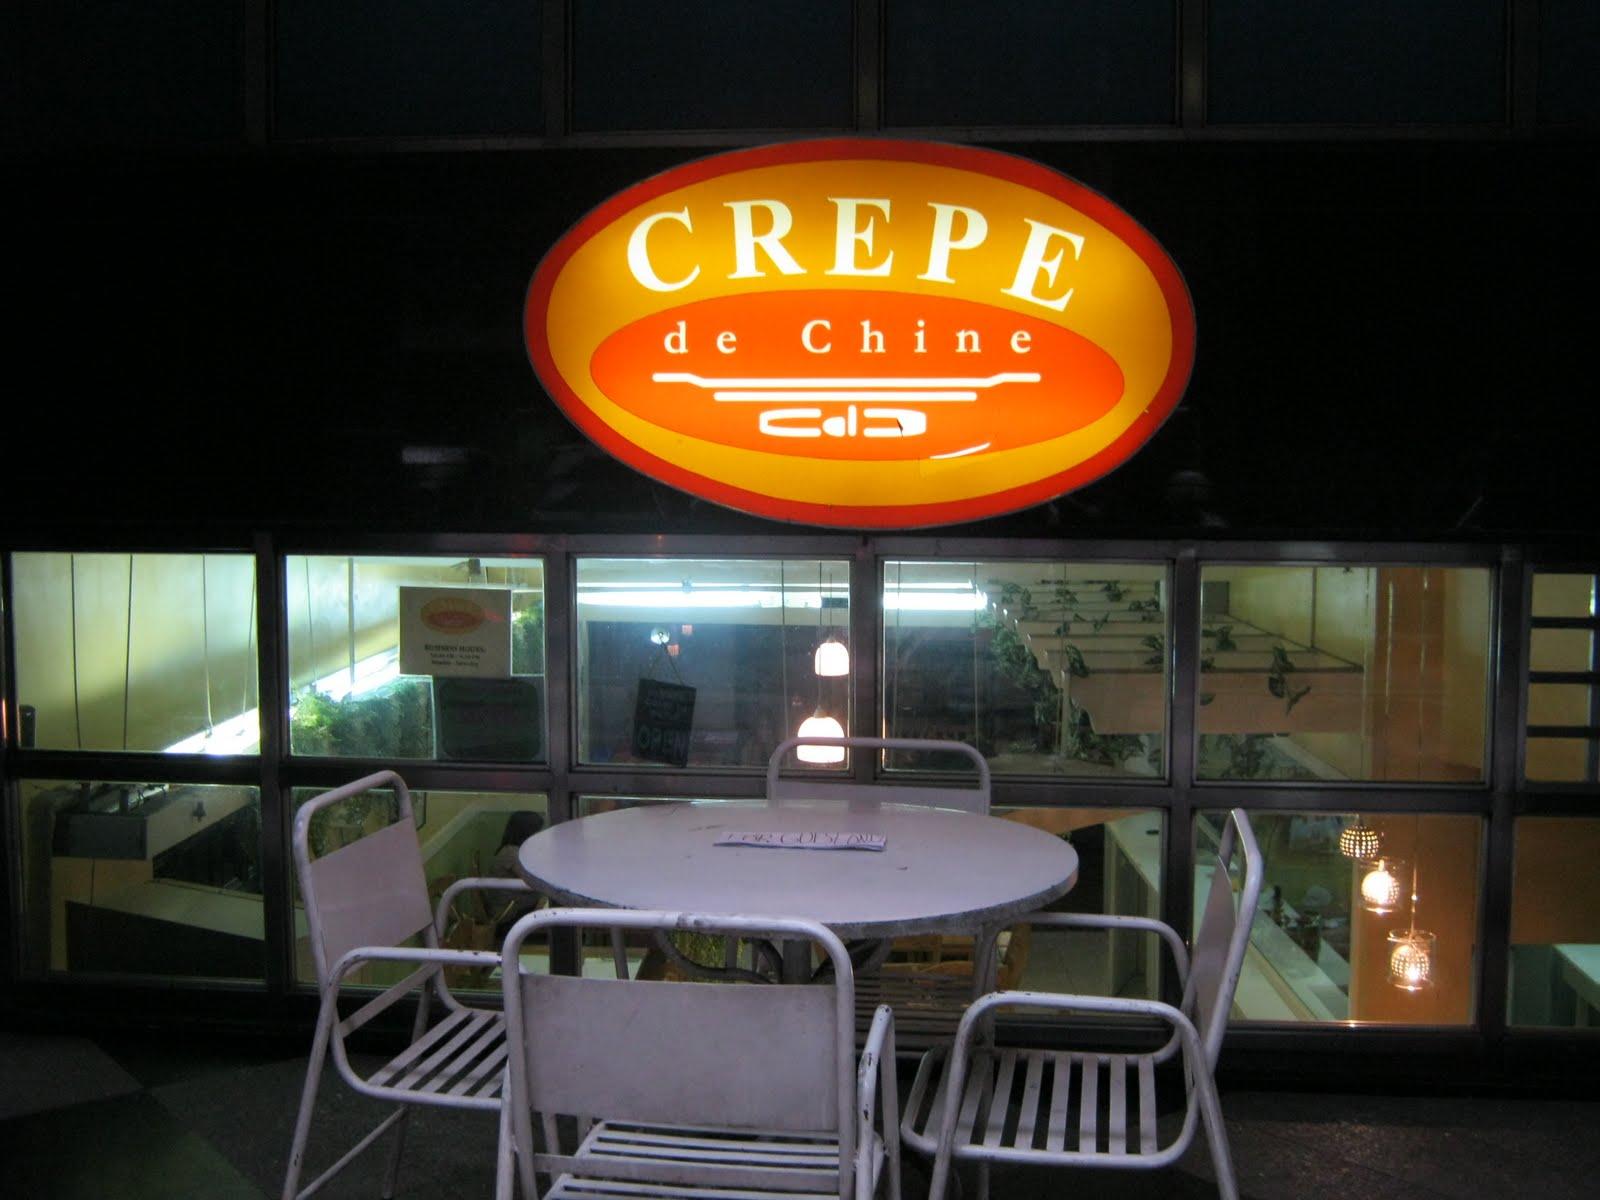 CREPE DE CHINE